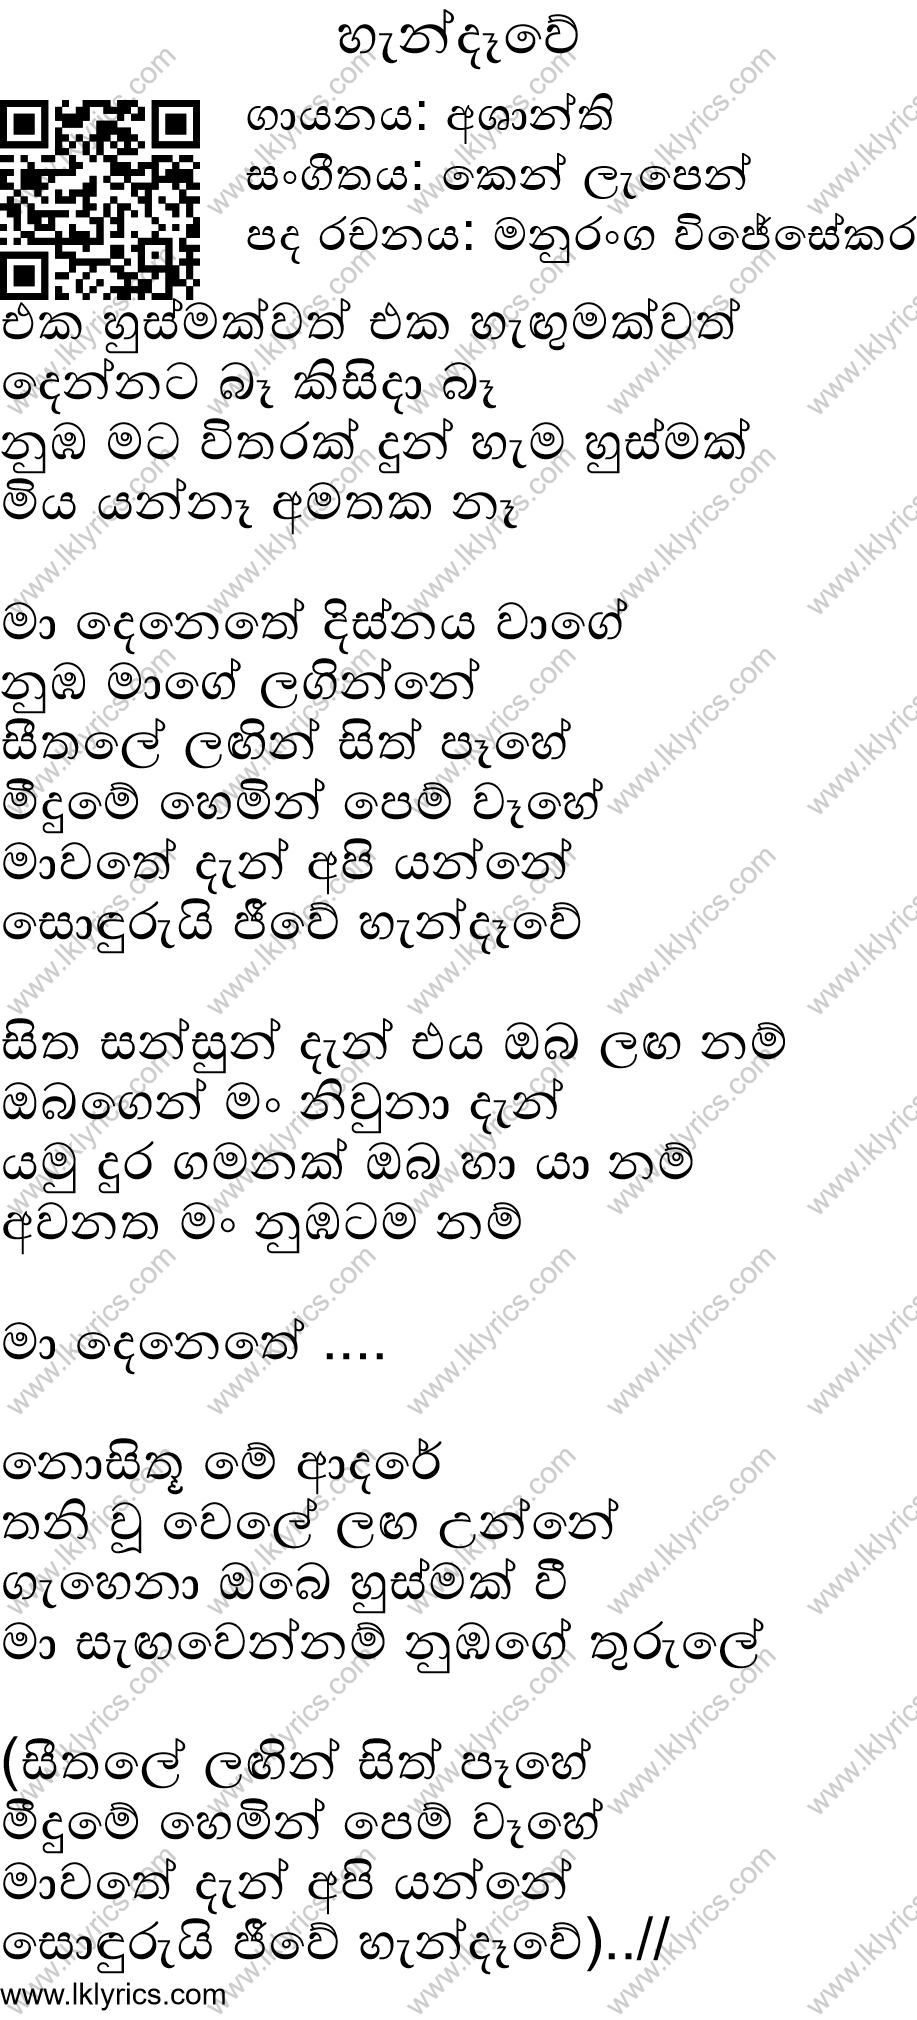 Handawe Lyrics - LK Lyrics